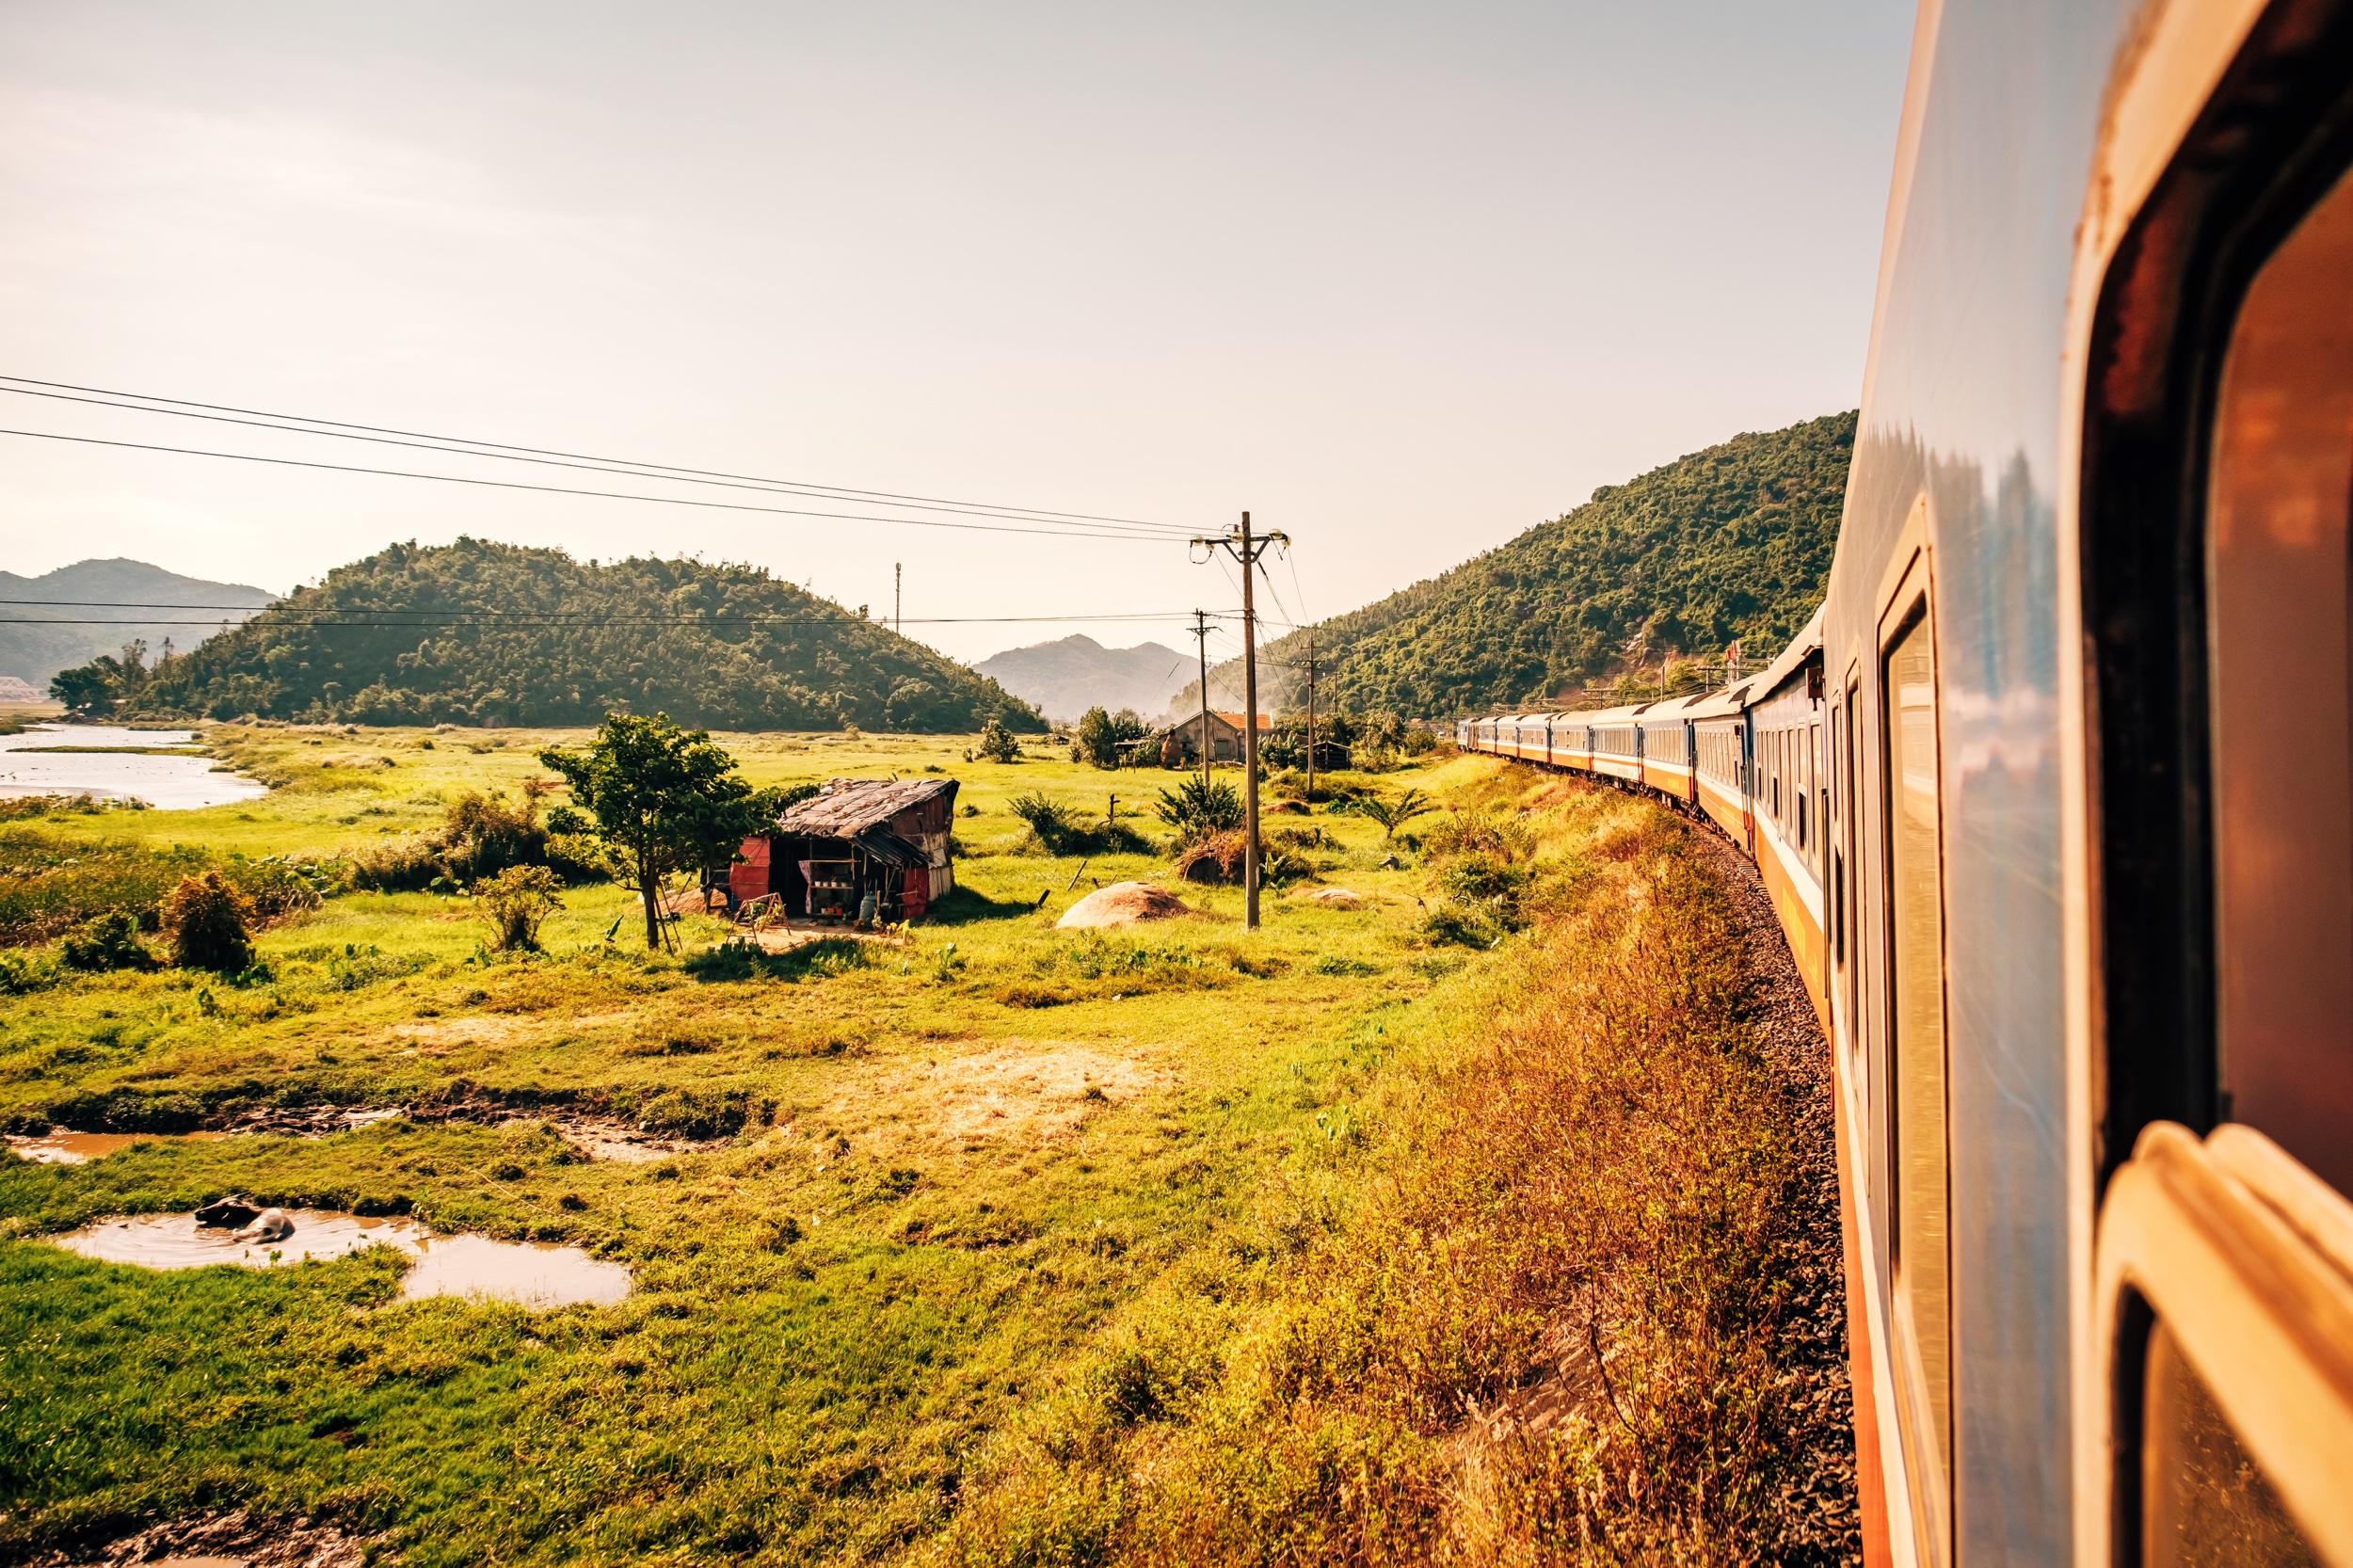 Train from Quy Nhon to Da Nang